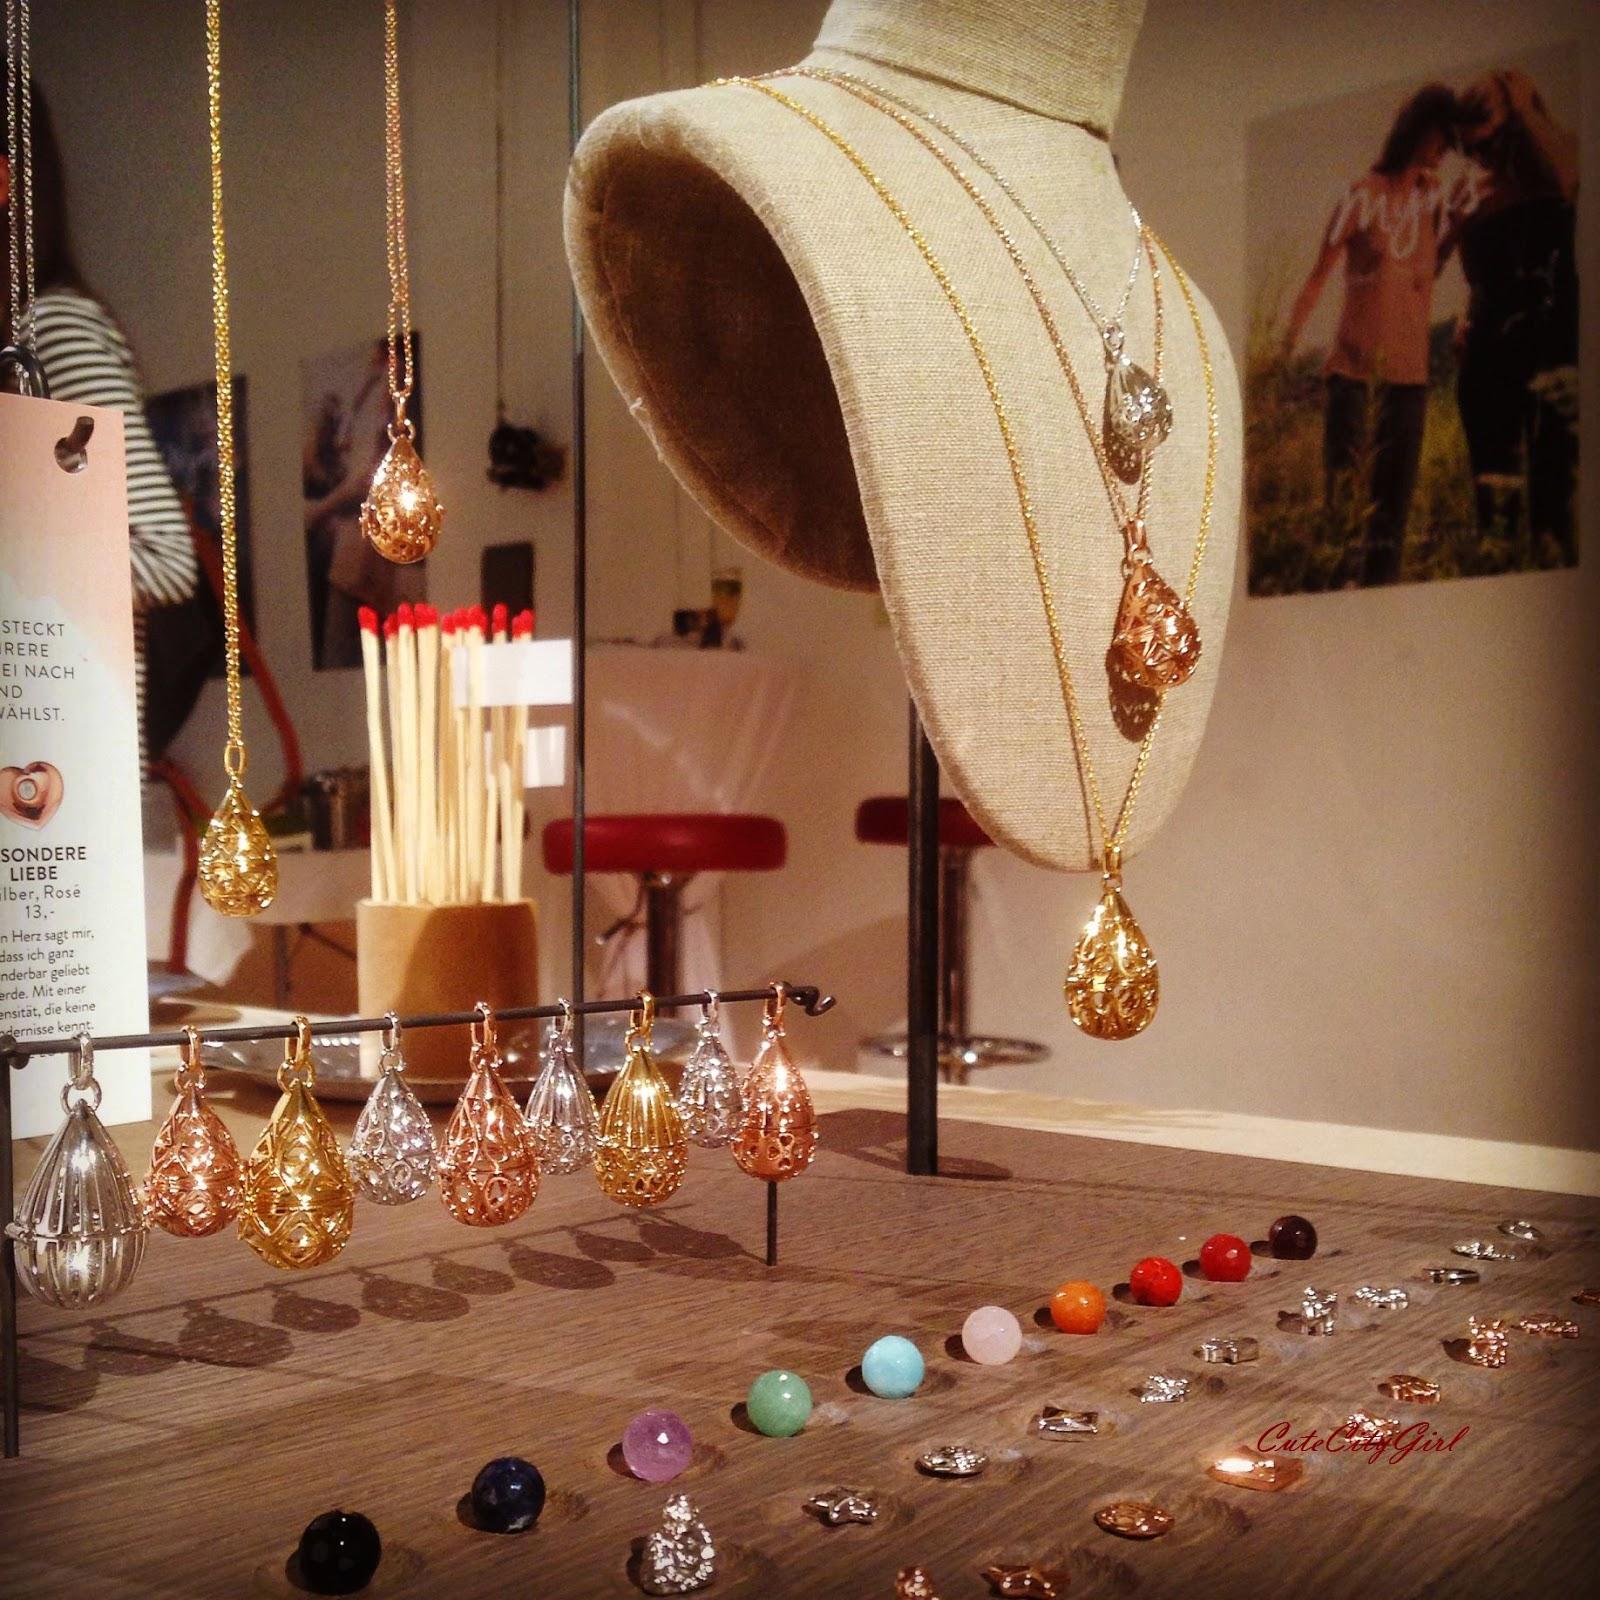 http://cutecitygirl.blogspot.co.at/2014/12/myns-by-xenox-jewellery.html